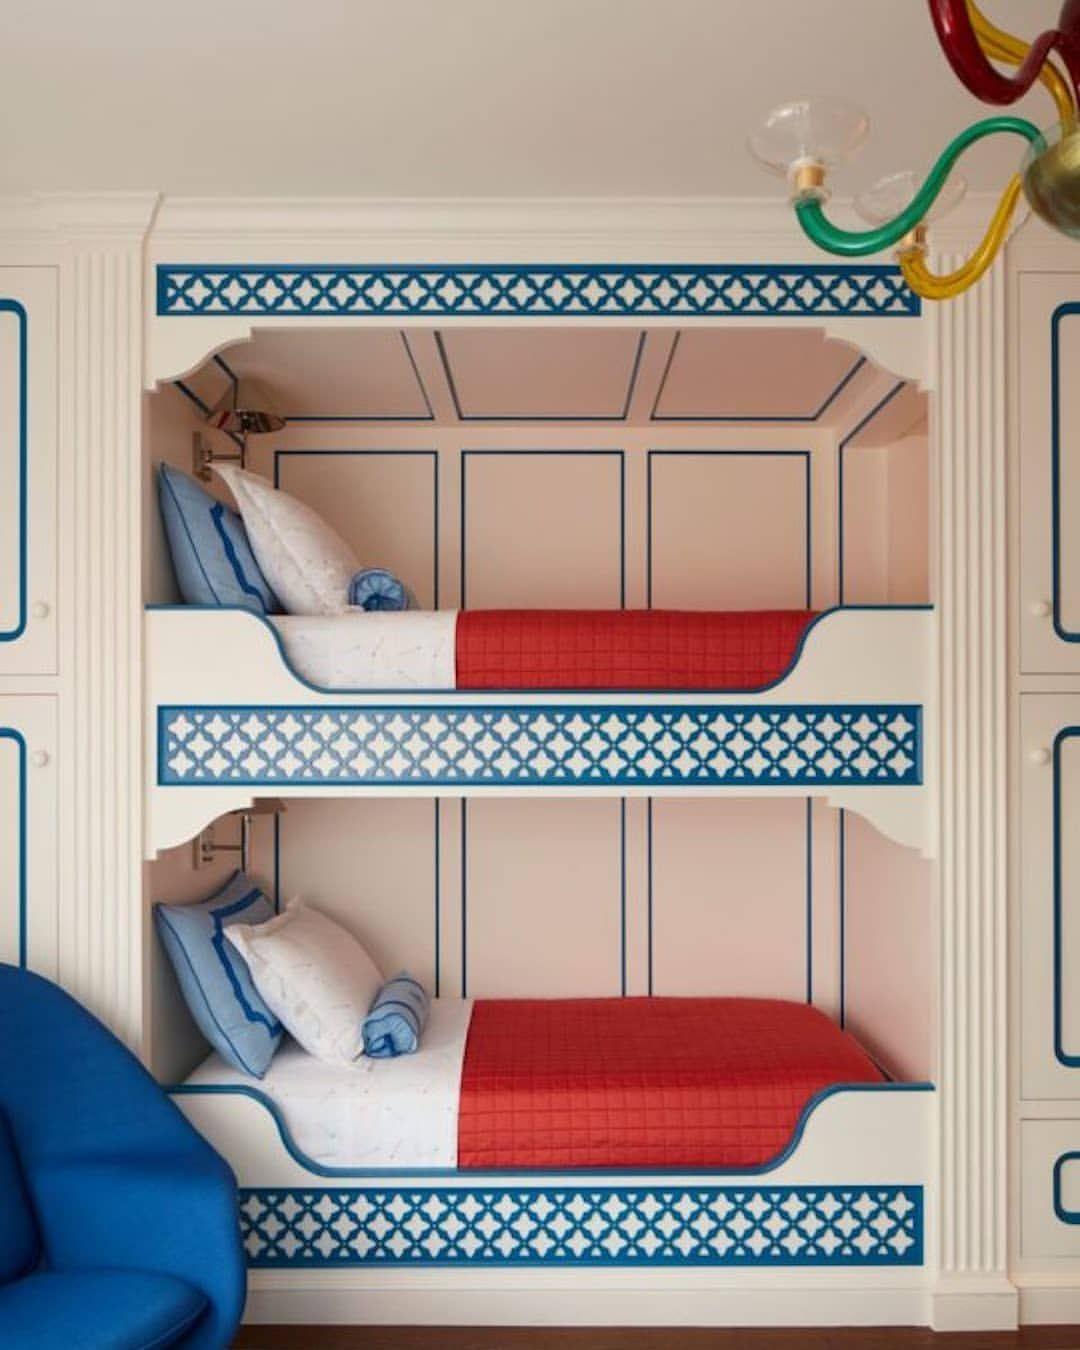 Pin By Kristen Landgrebe Vandivier On Bunk Beds Bunk Bed Designs